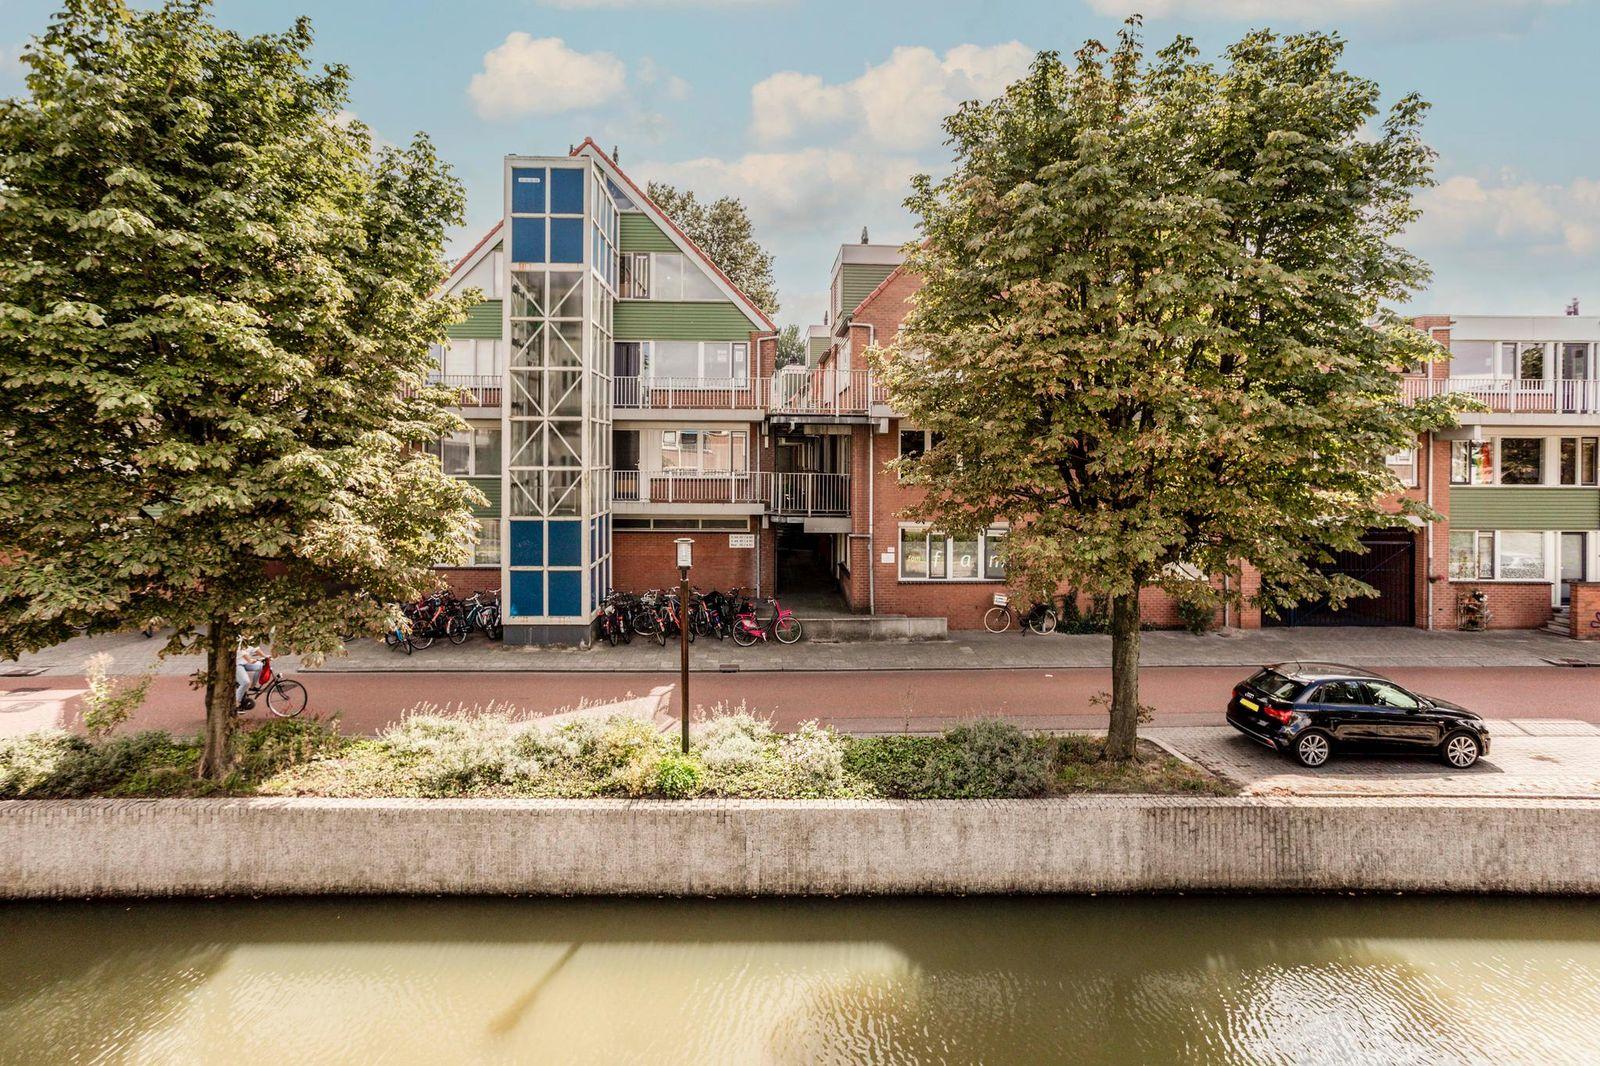 Hondsrug 645, Utrecht